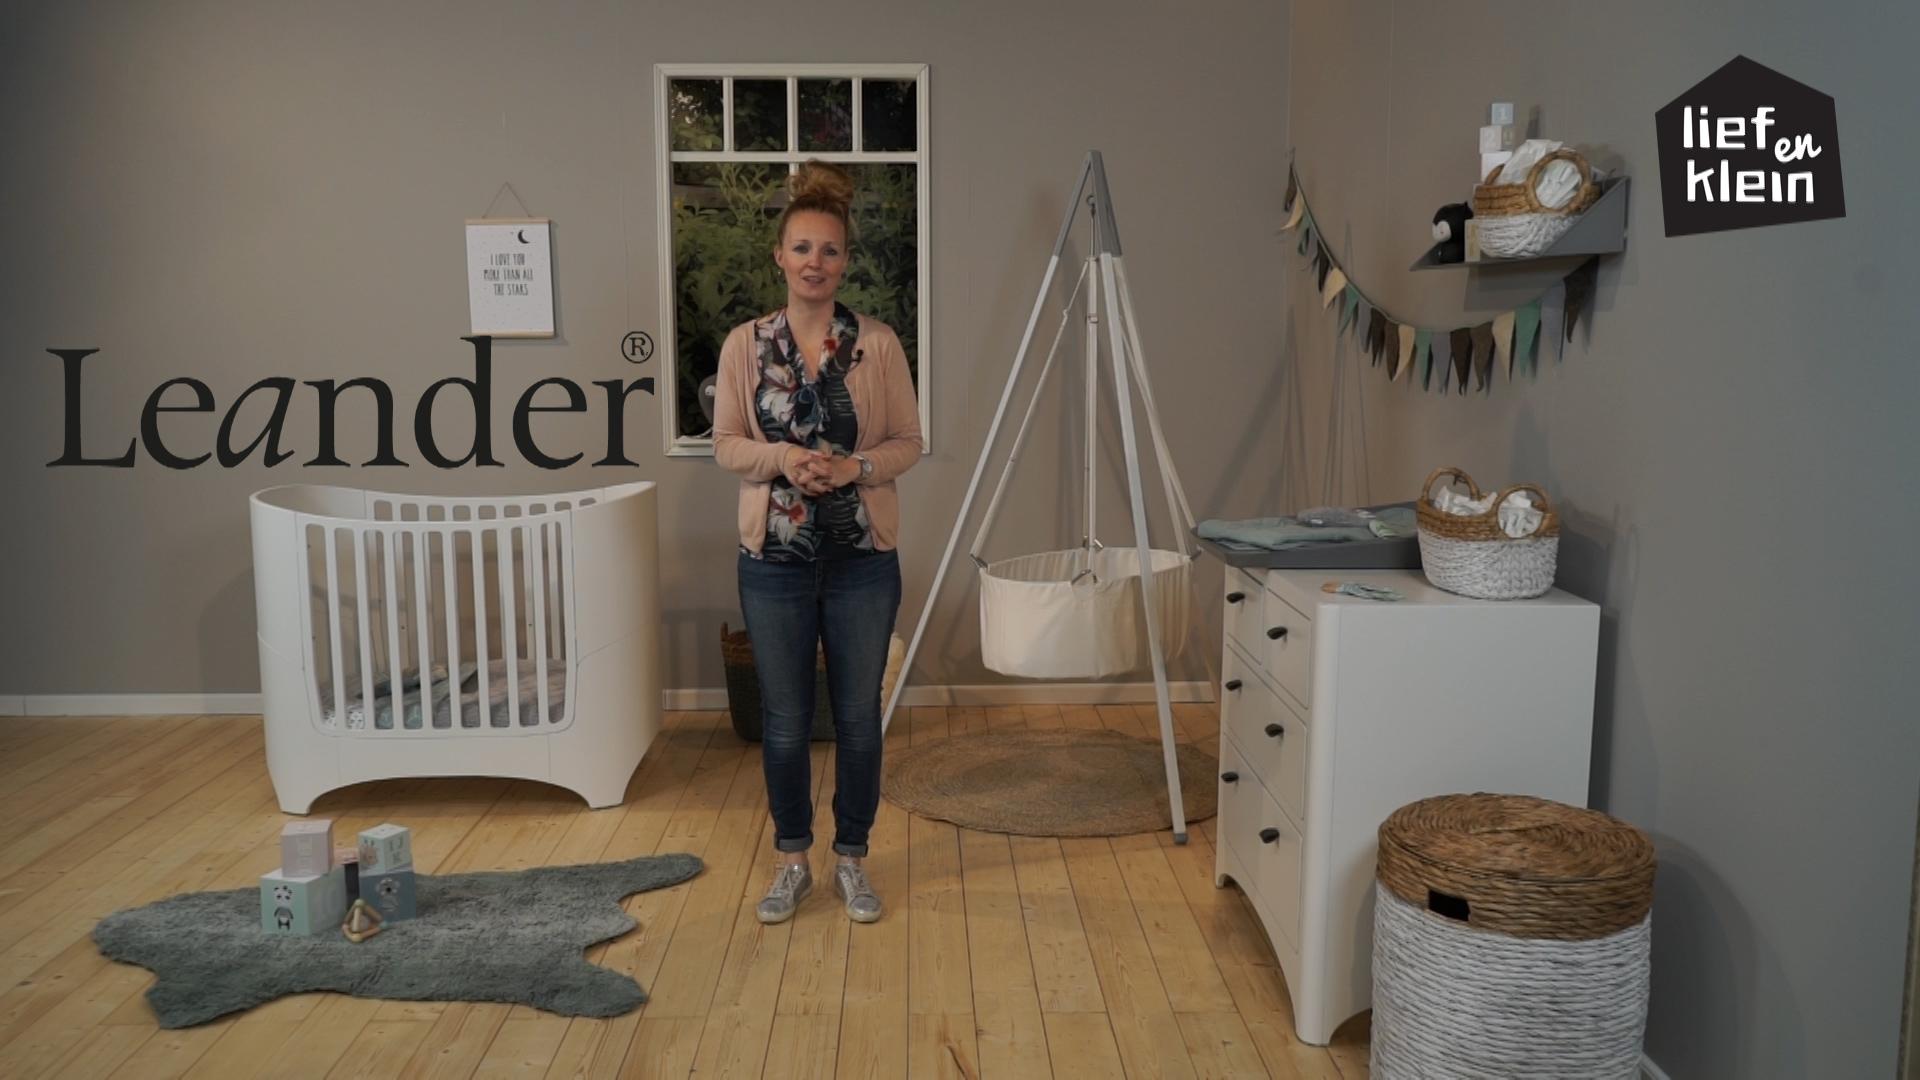 Lieve Stoere Kinderkamer : Inspiratie babykamer leander lief en klein